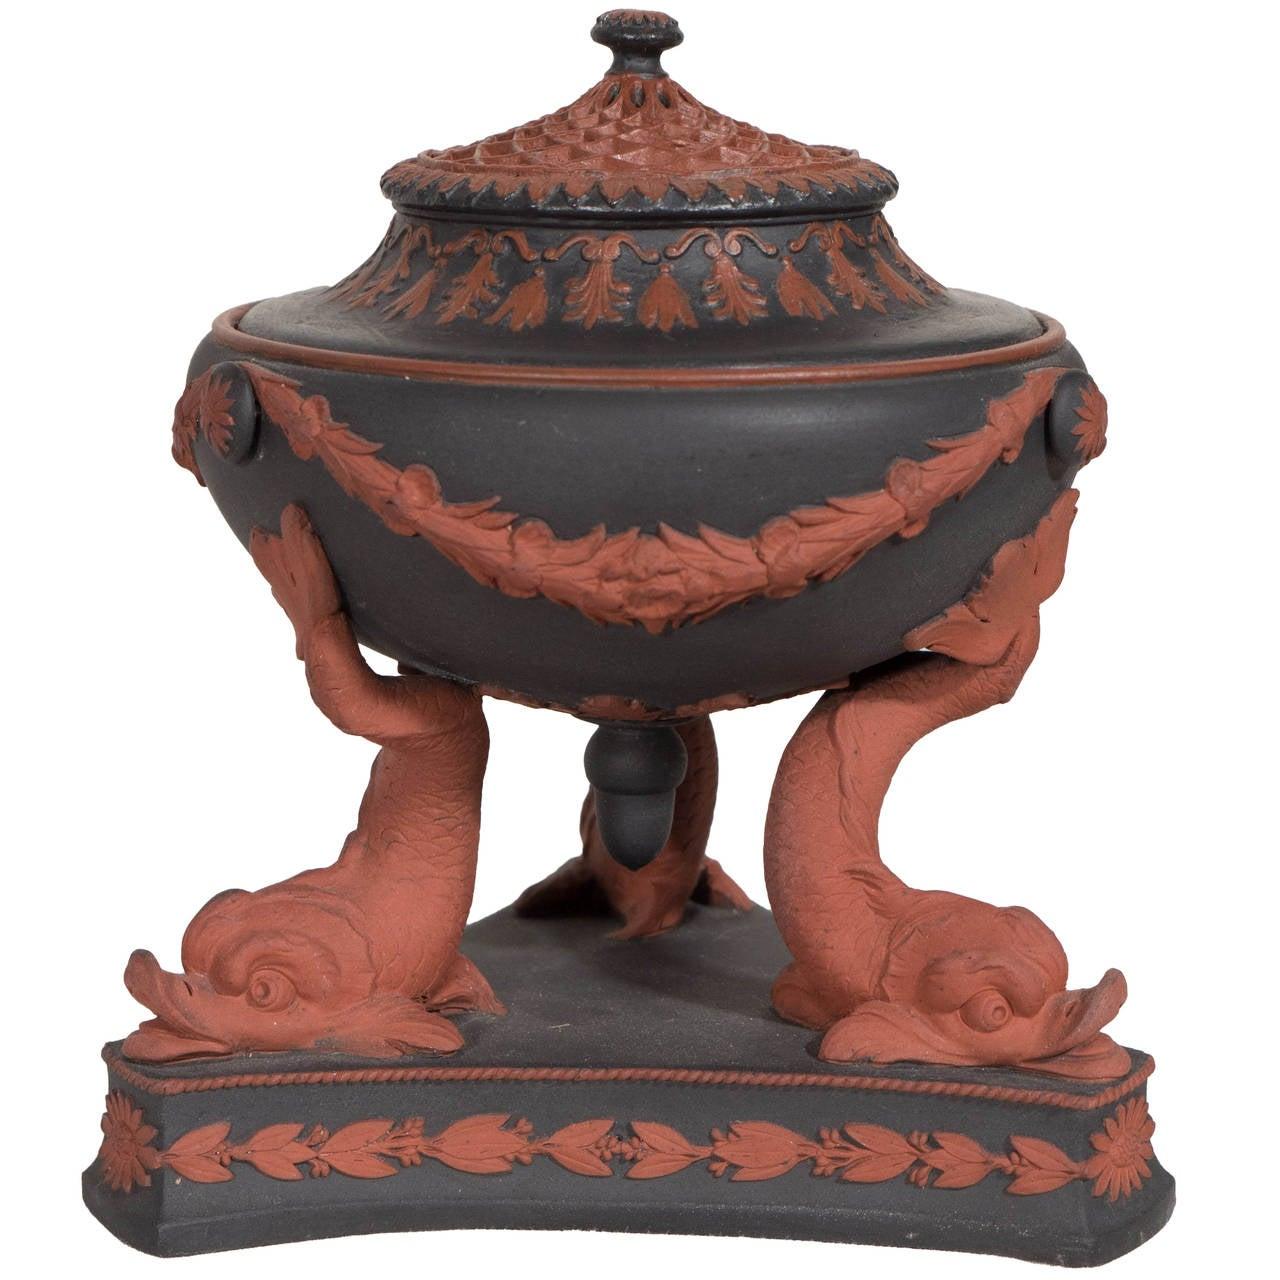 Wedgwood Egyptian Revival Black Basalt and Rosso Antico Incense Burner For Sale